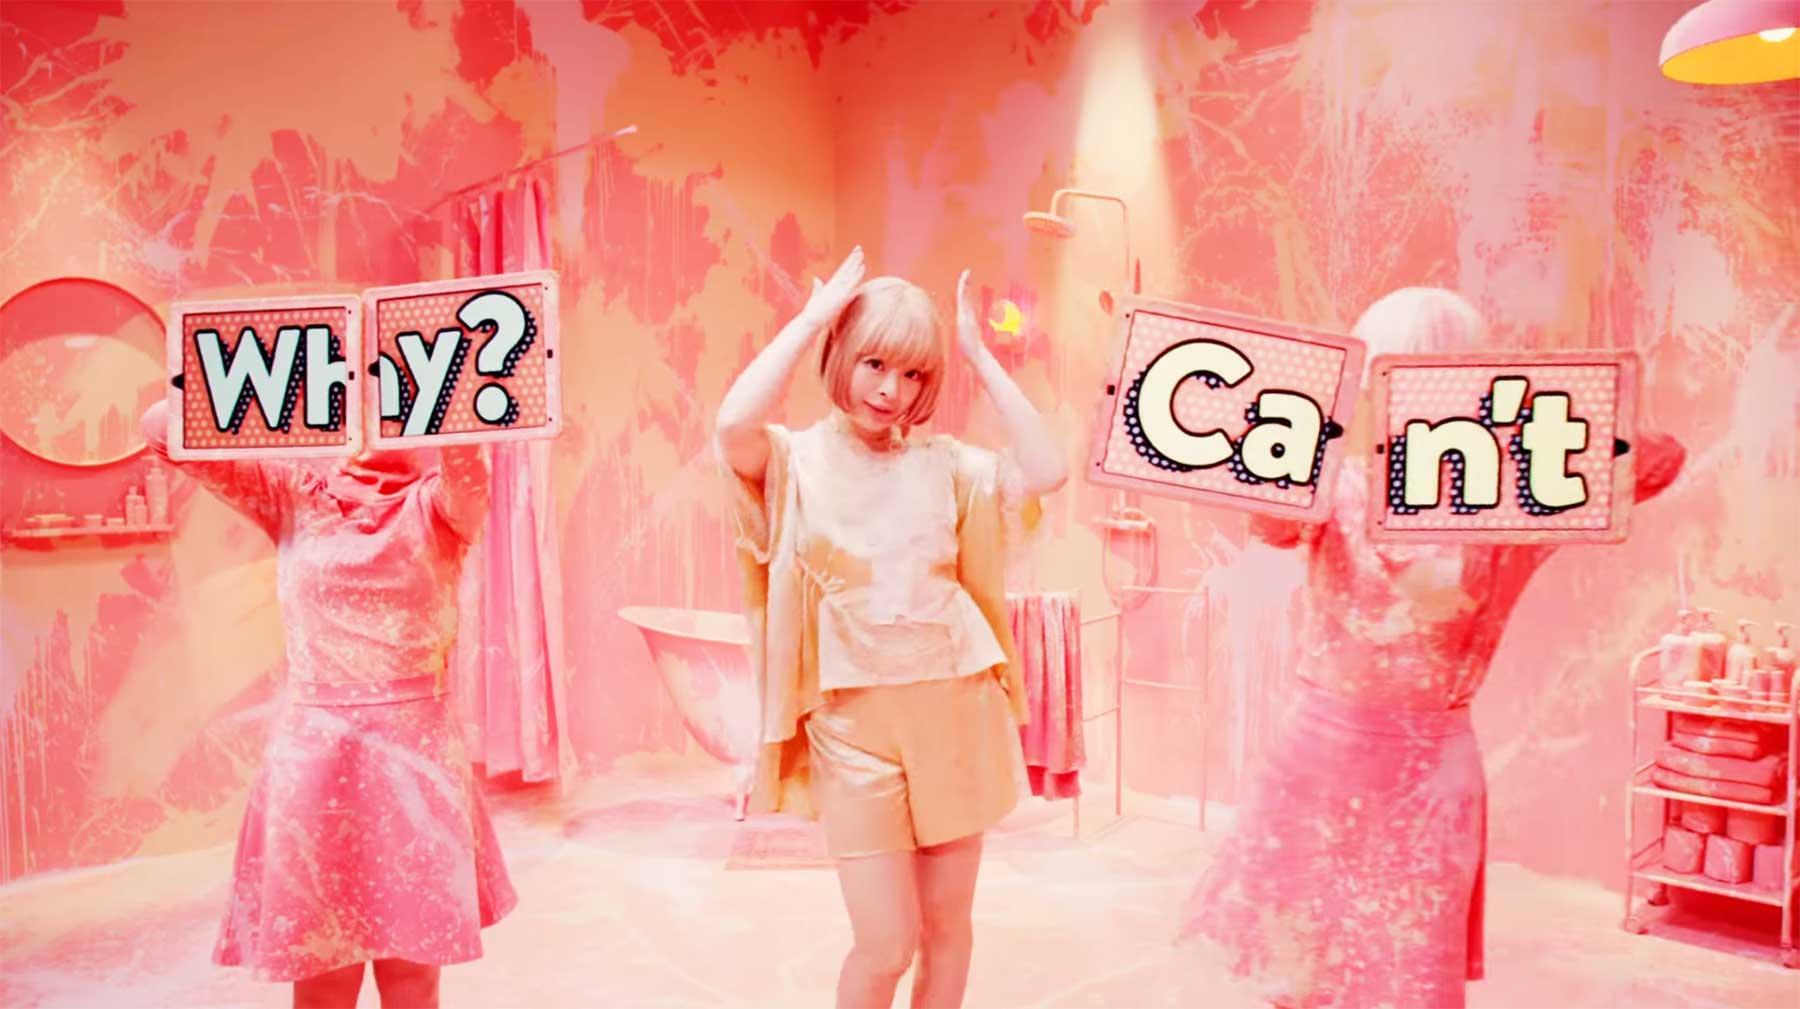 Musikvideo mit lauter eingespielten Tablet-Screens KYARY-PAMYU-PAMYU_Kimino-Mikata